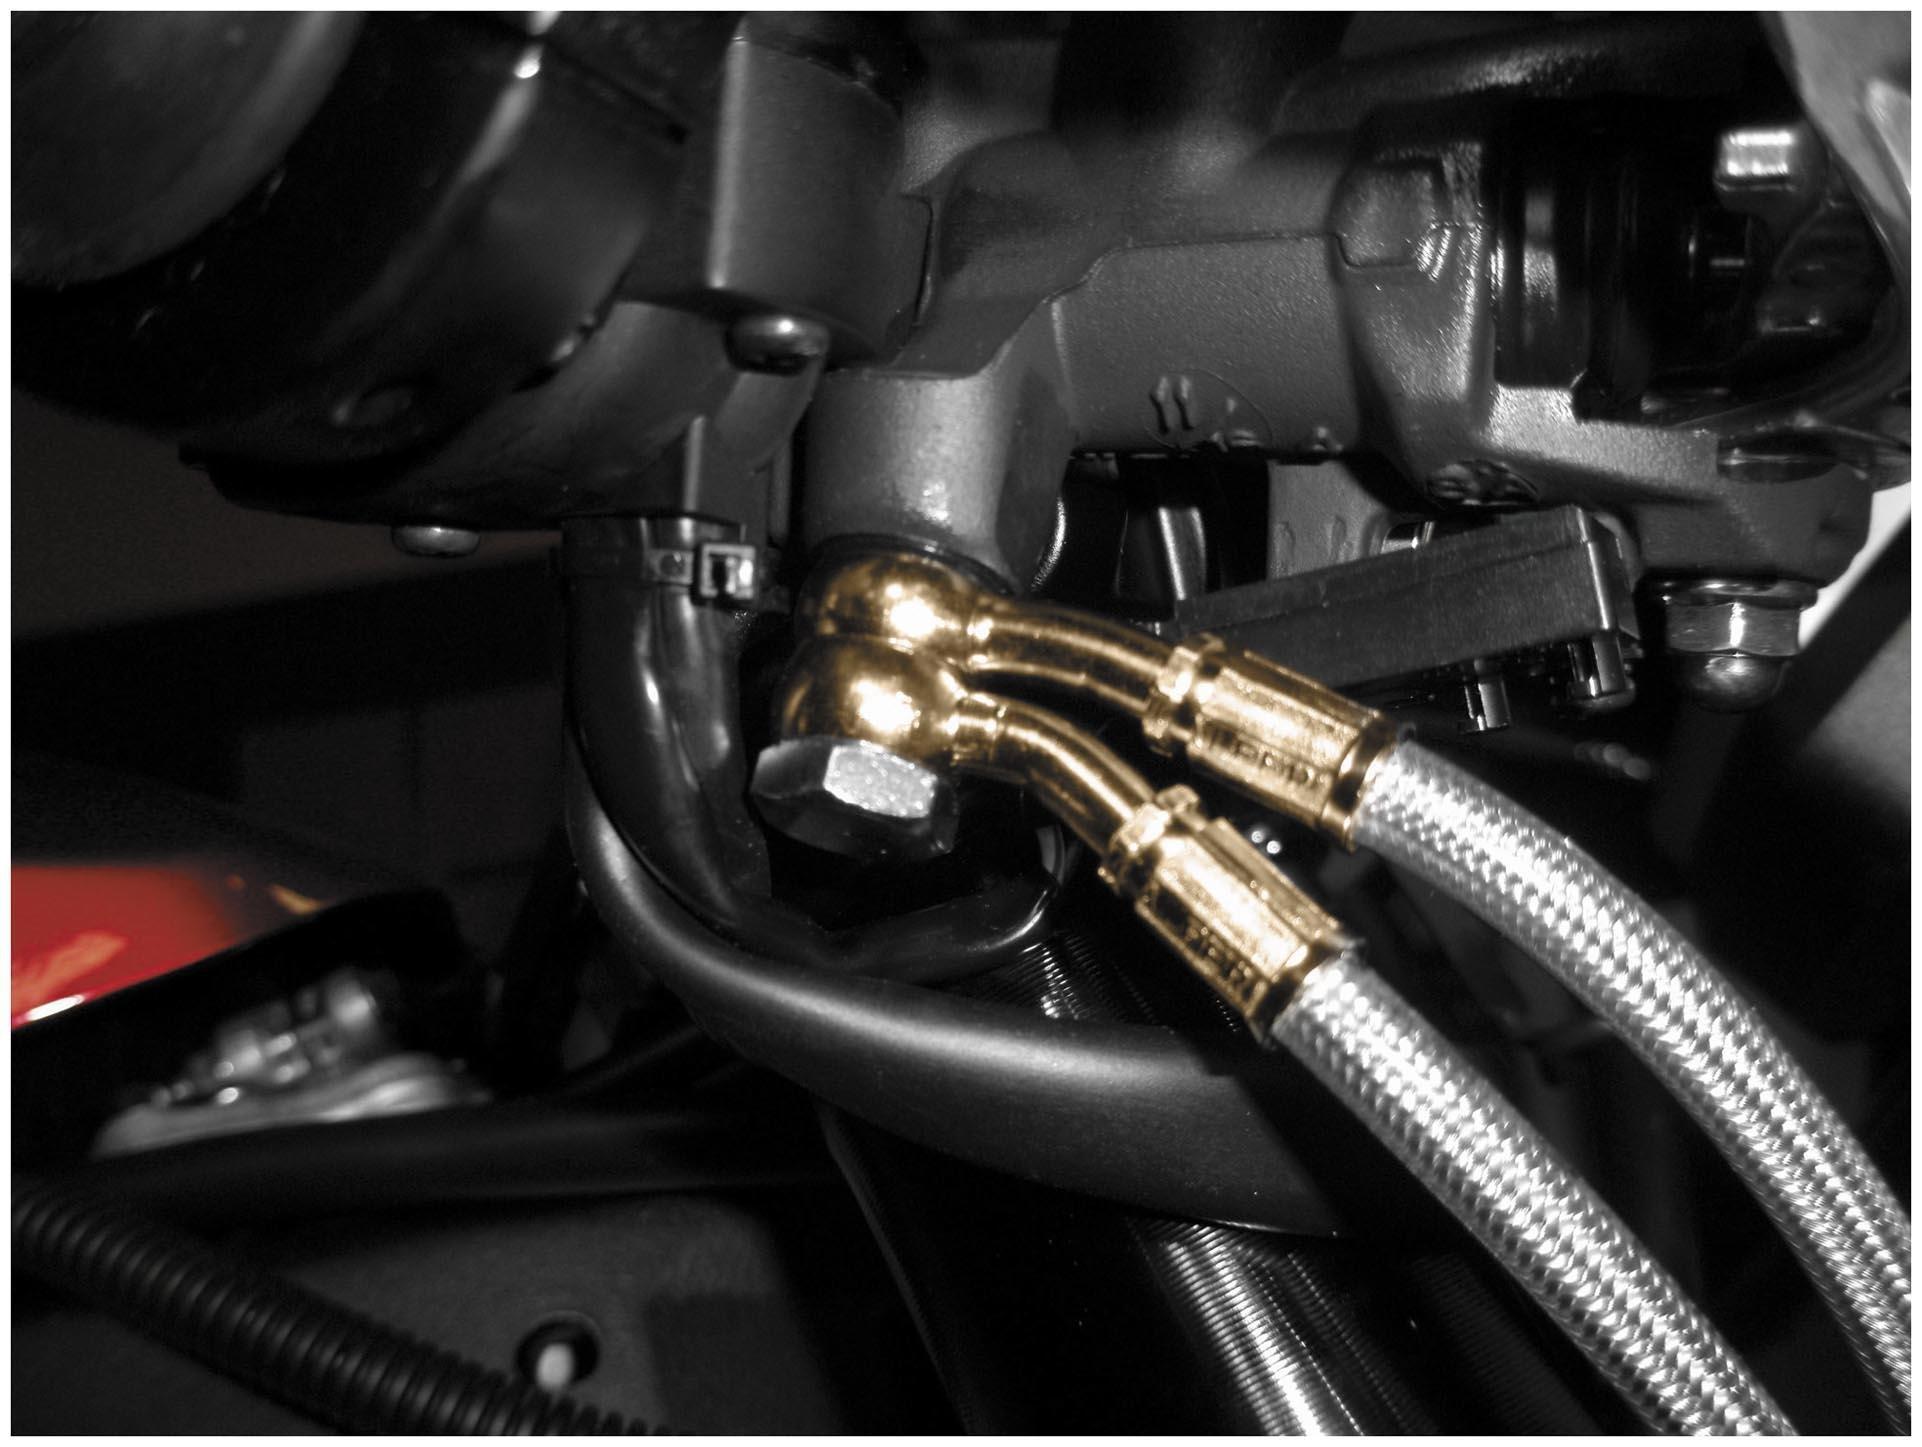 Galfer Brakes Sportbike Stainless Steel Hydraulic Brake Line FK003D327